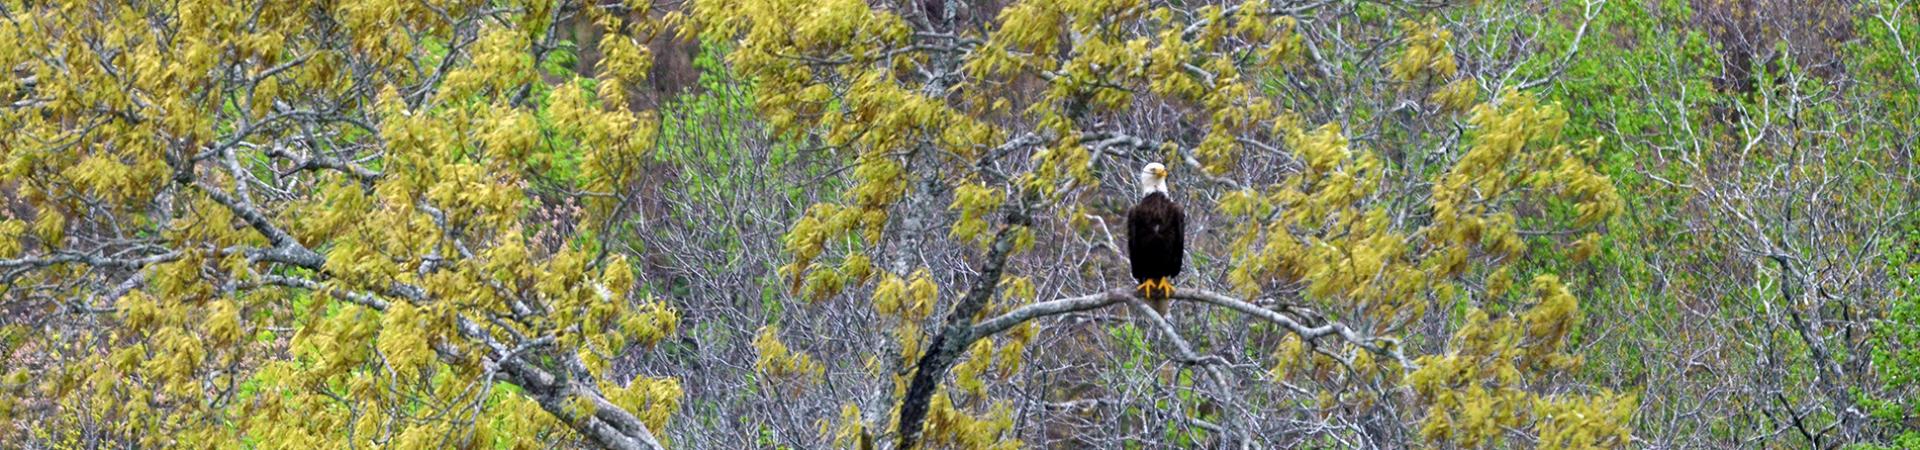 Perched Eagle